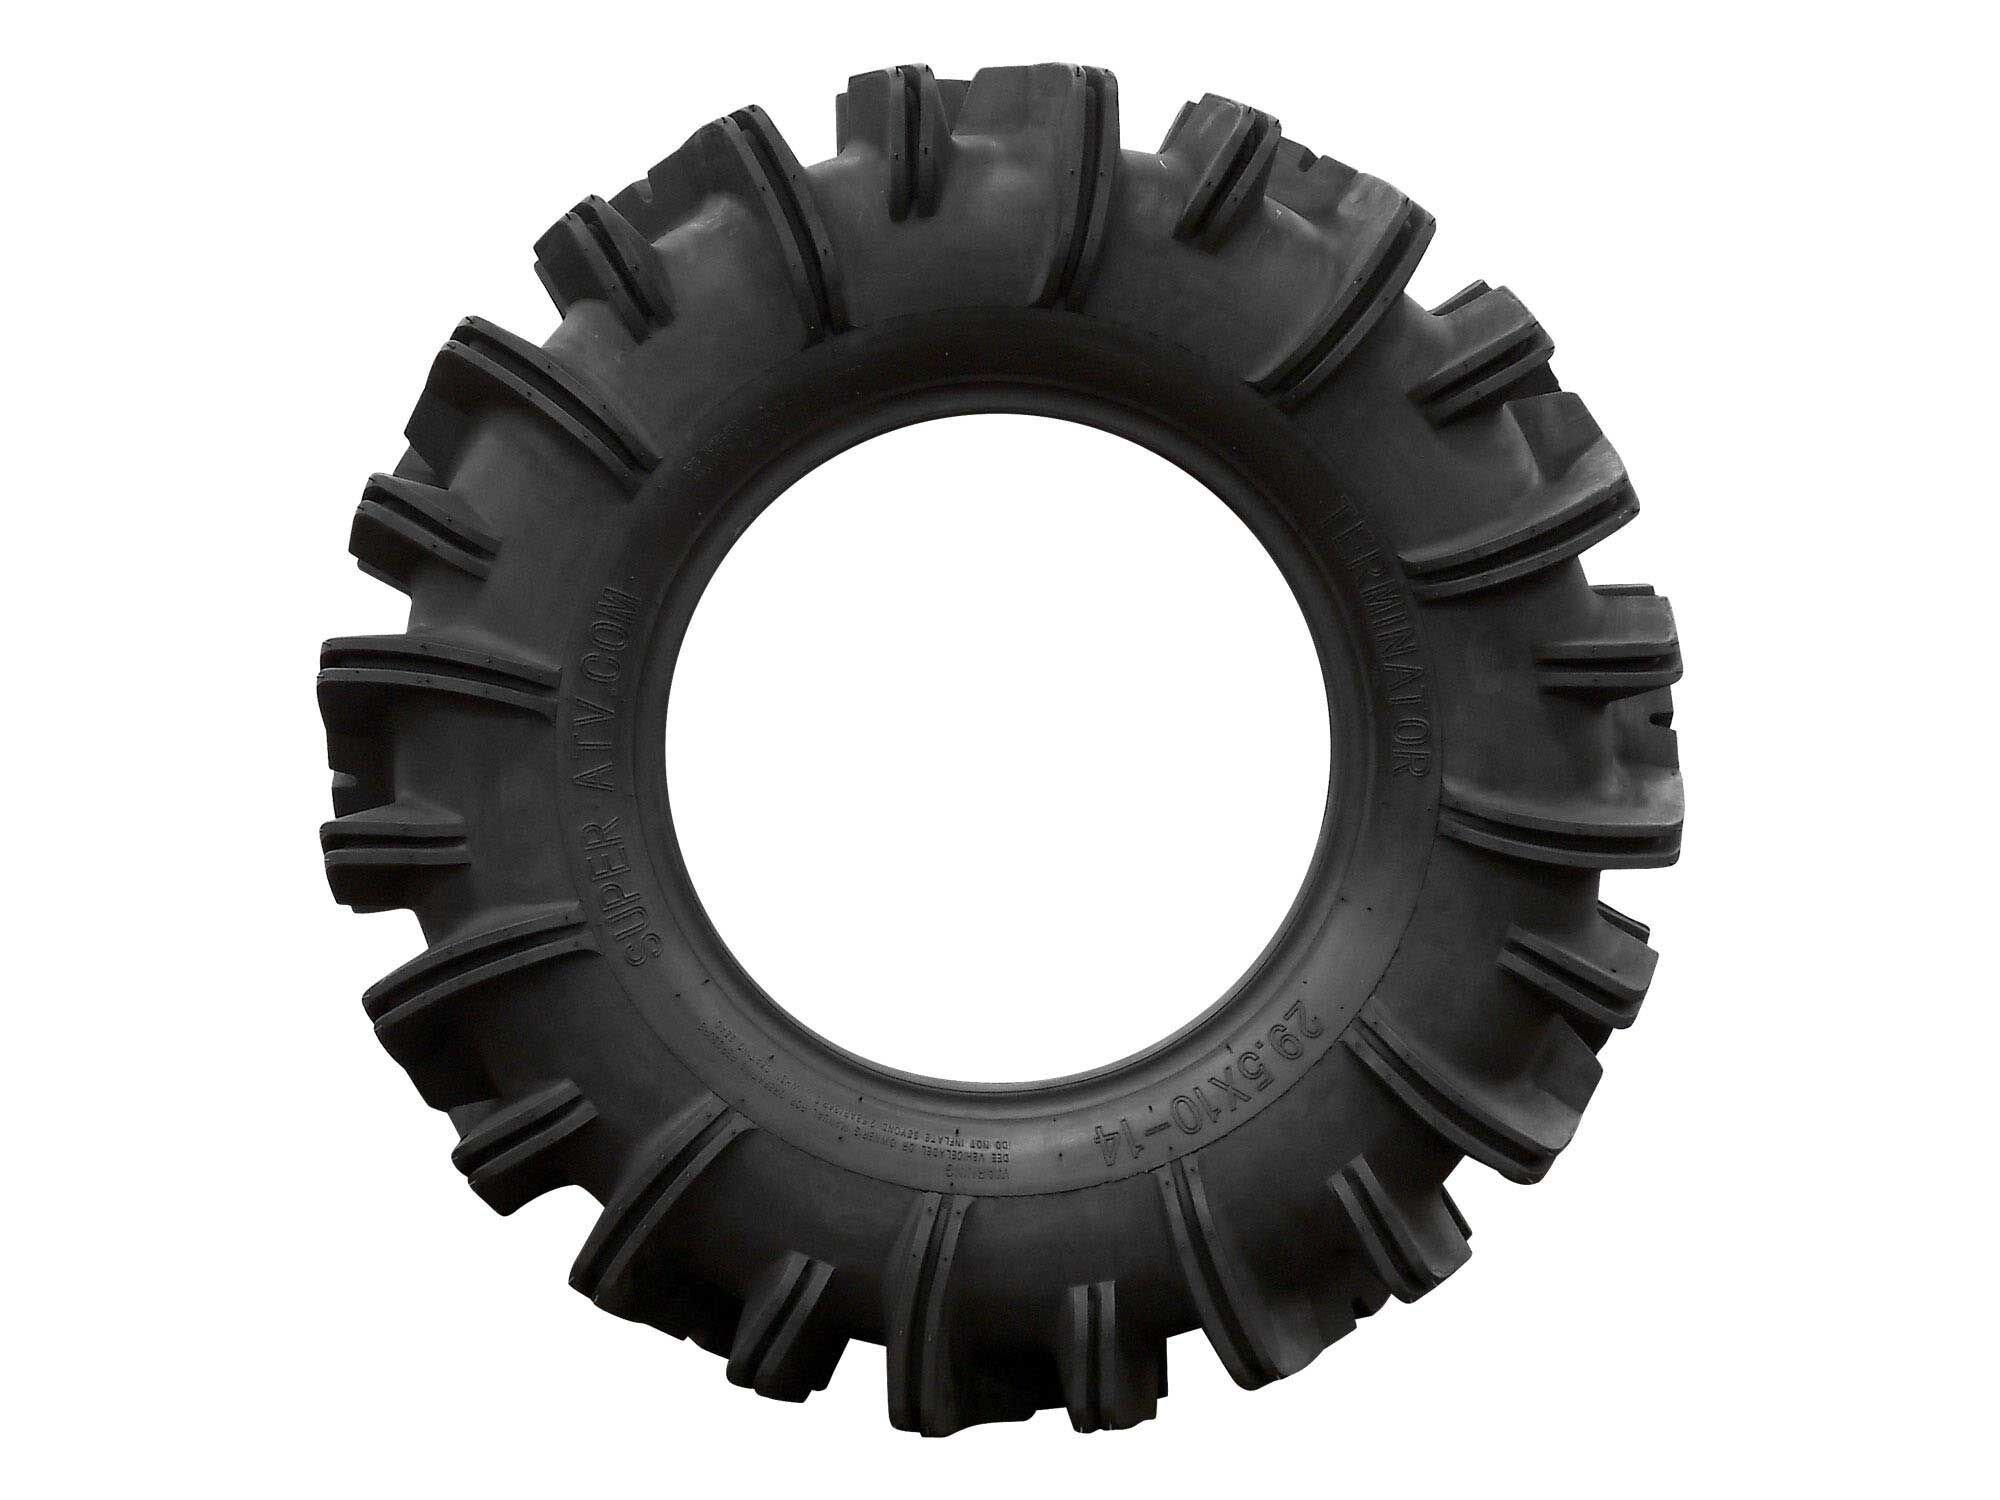 SuperATV Terminator Mud Tire - RZR, X3, General, Maverick, Ranger, Rock & All Terrain UTV - (29.5x10-14)